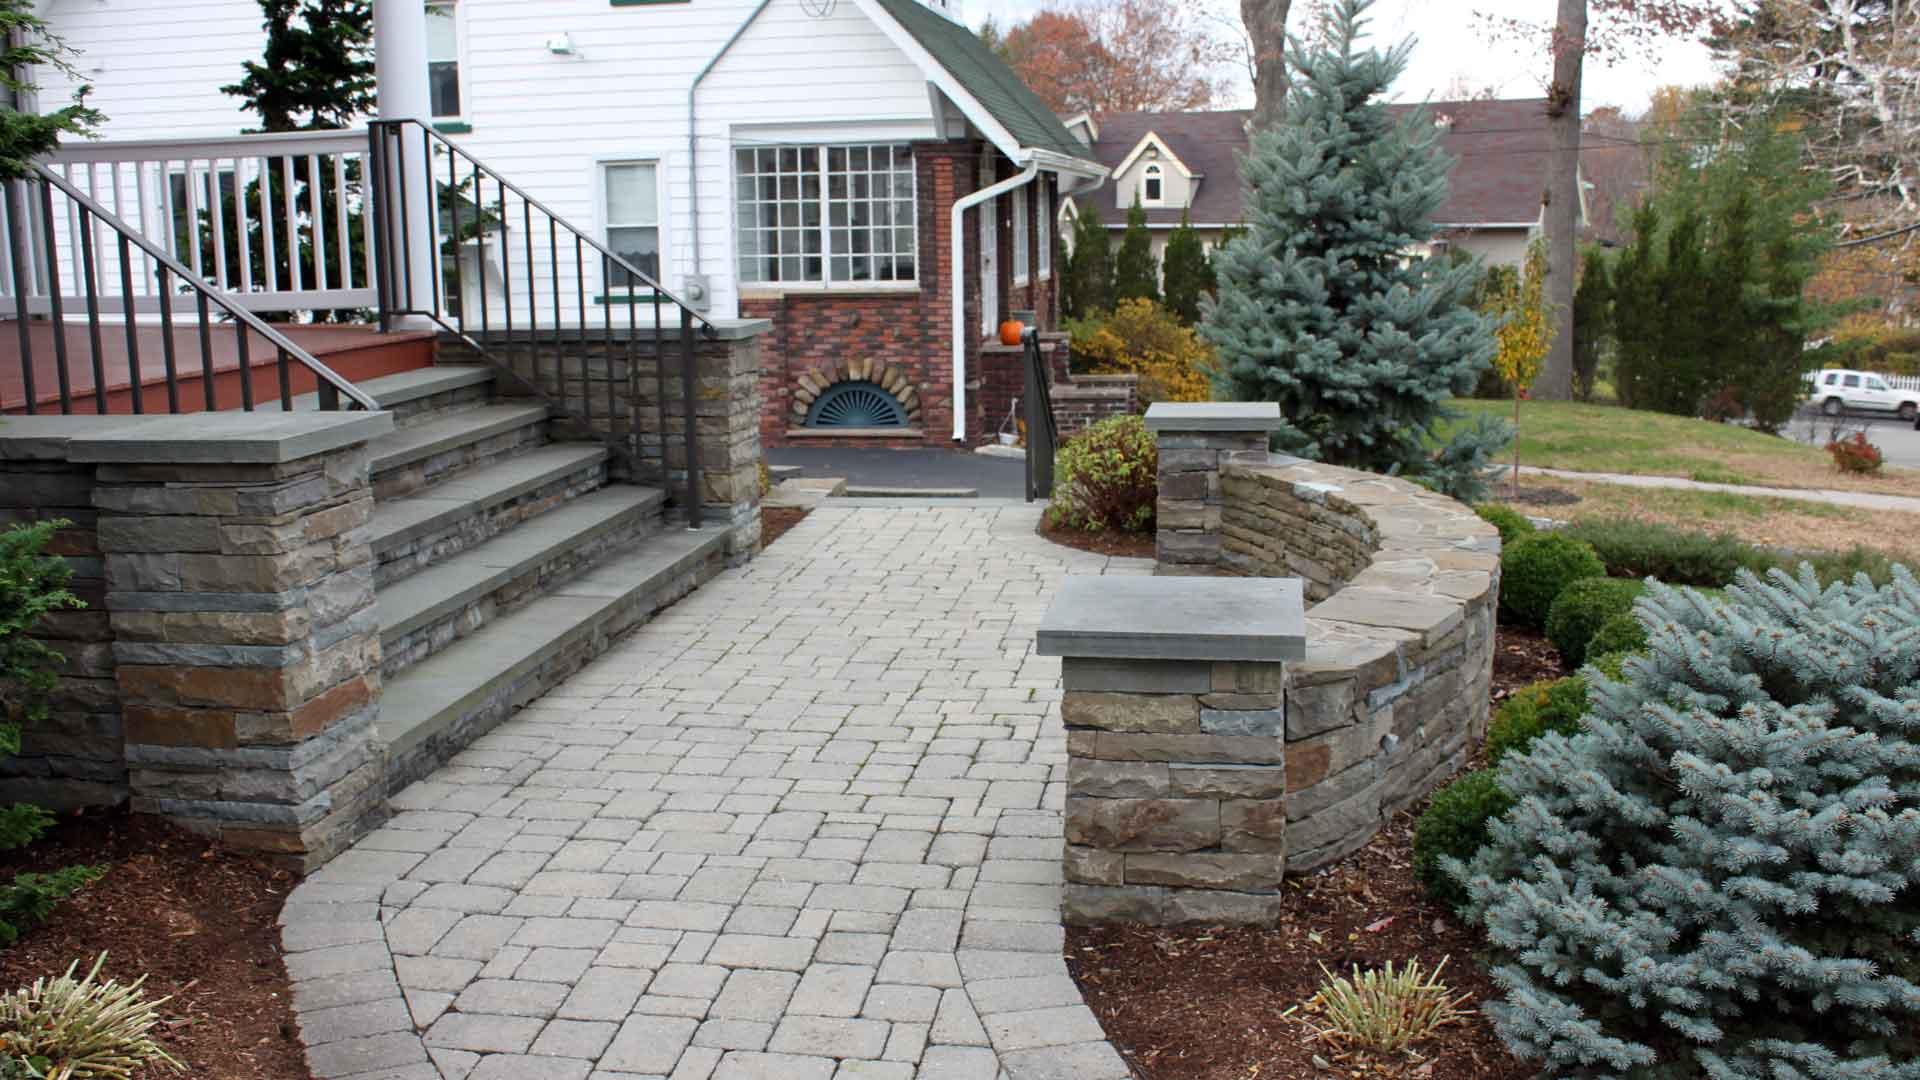 Auburn-Sky-Landscaping-Front-Patio-Steps-Sitting-Wall.jpg